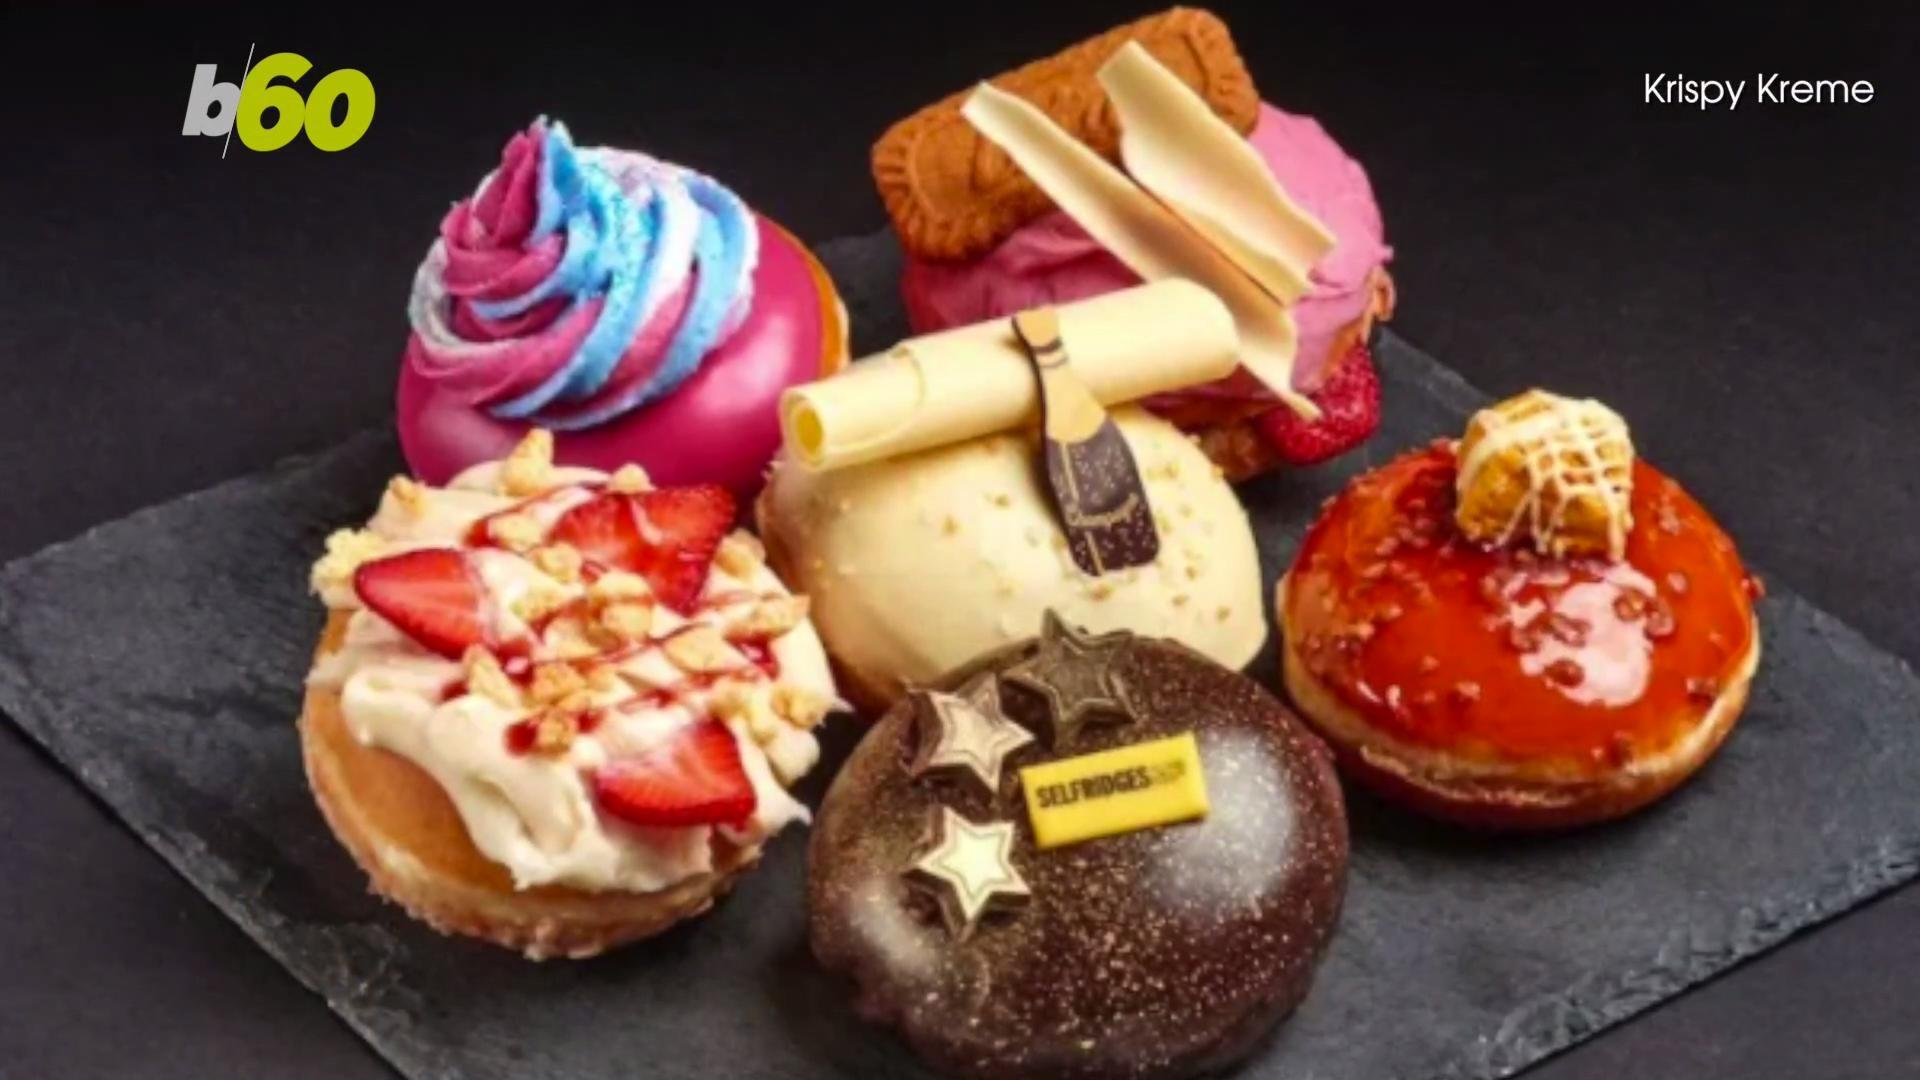 Krispy Kreme Releases Exclusive Champagne Donut